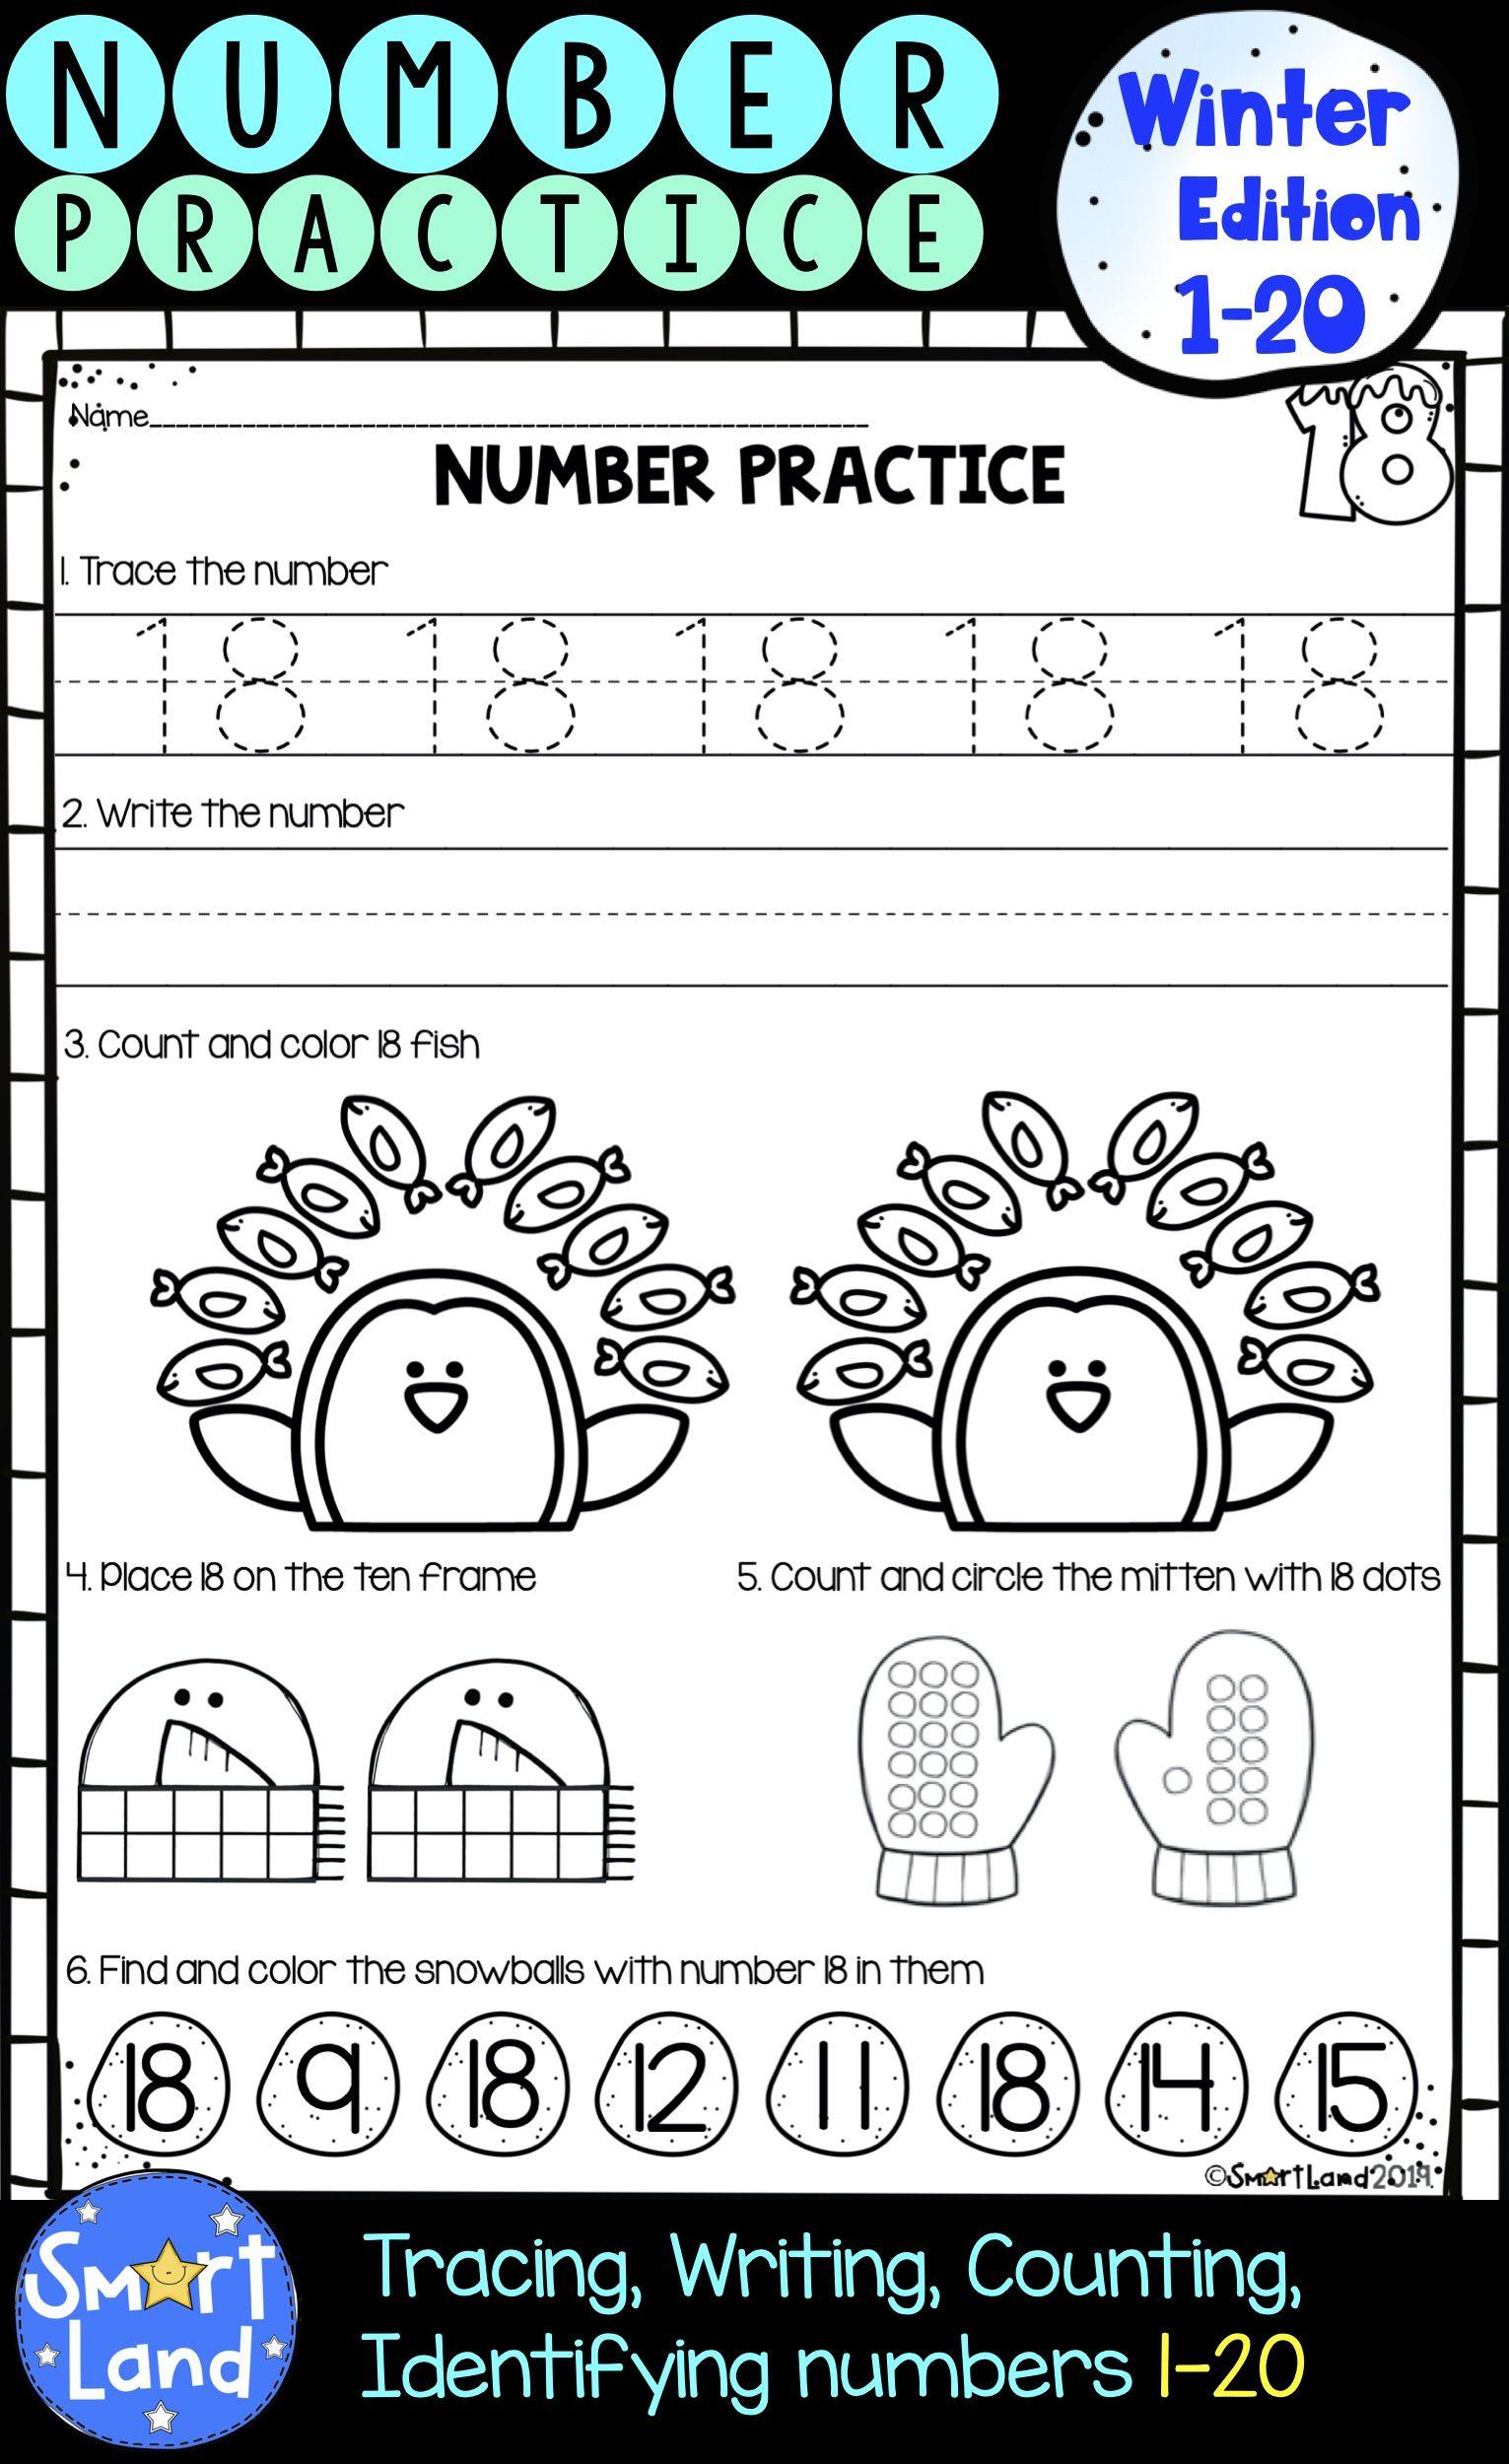 Numbers 1 20 Handwriting And Counting Practice Worksheets Winter Edition Kindergarten Worksheets Kindergarten Addition Worksheets Math Number Sense [ 2500 x 1531 Pixel ]